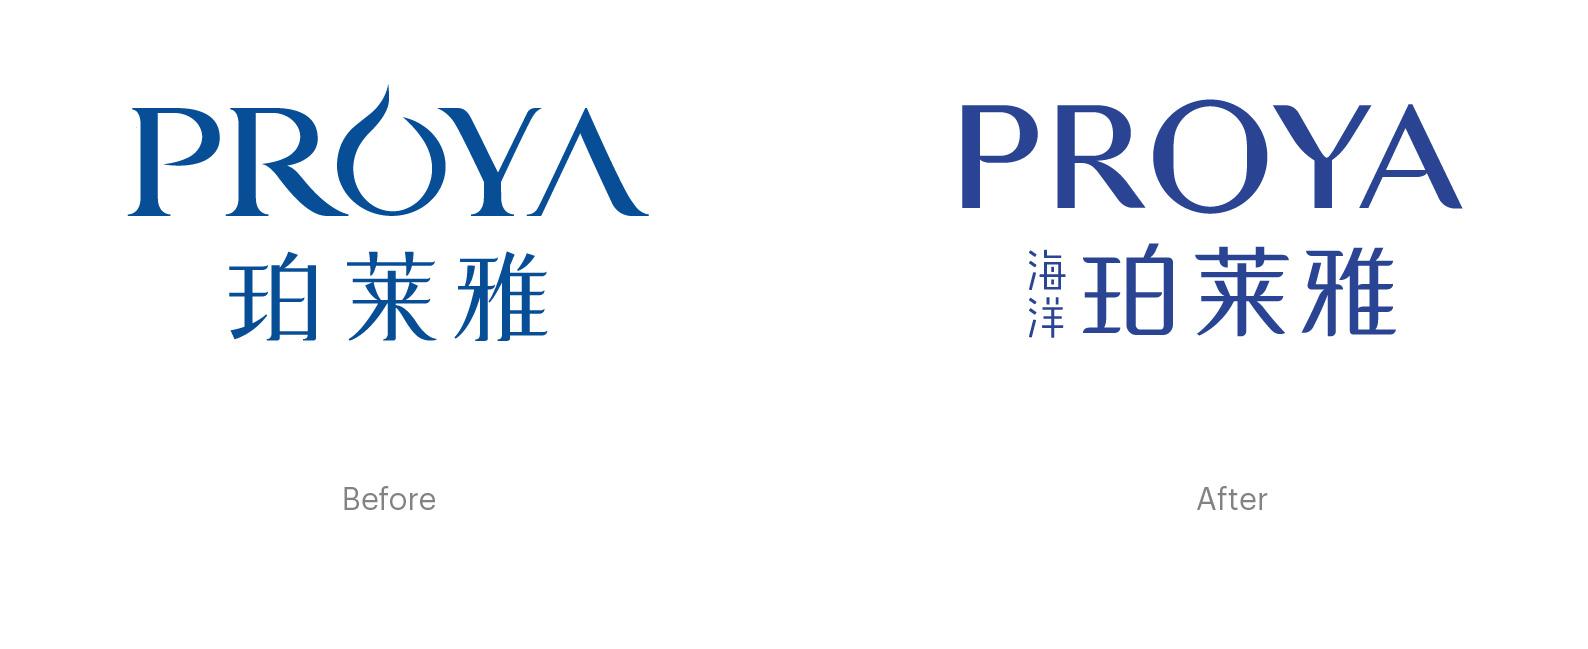 proya_01.jpg